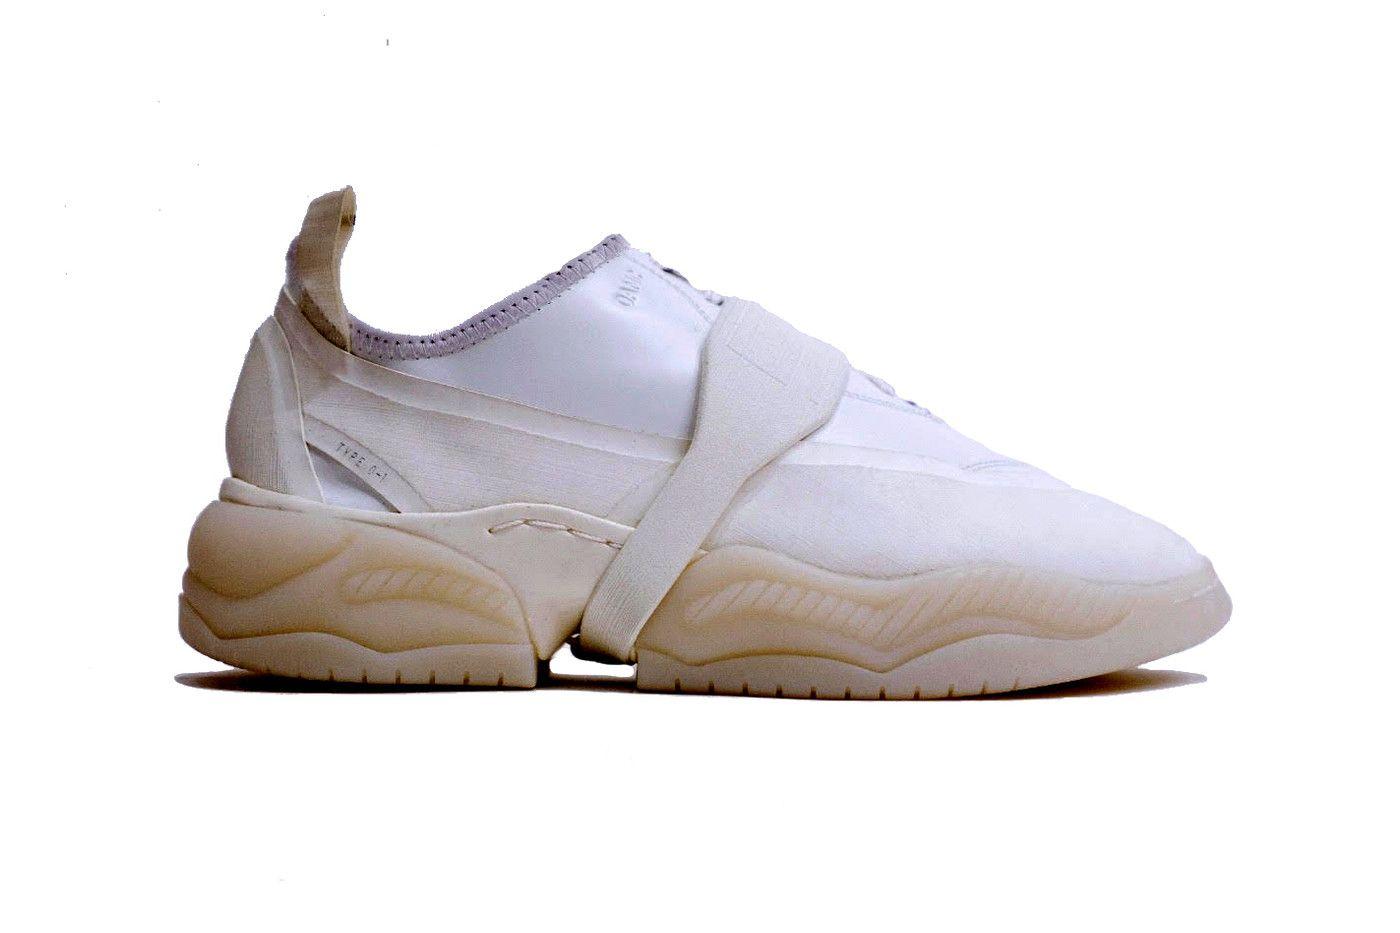 An Exclusive Look at OAMC's FW19 adidas Originals Sneaker